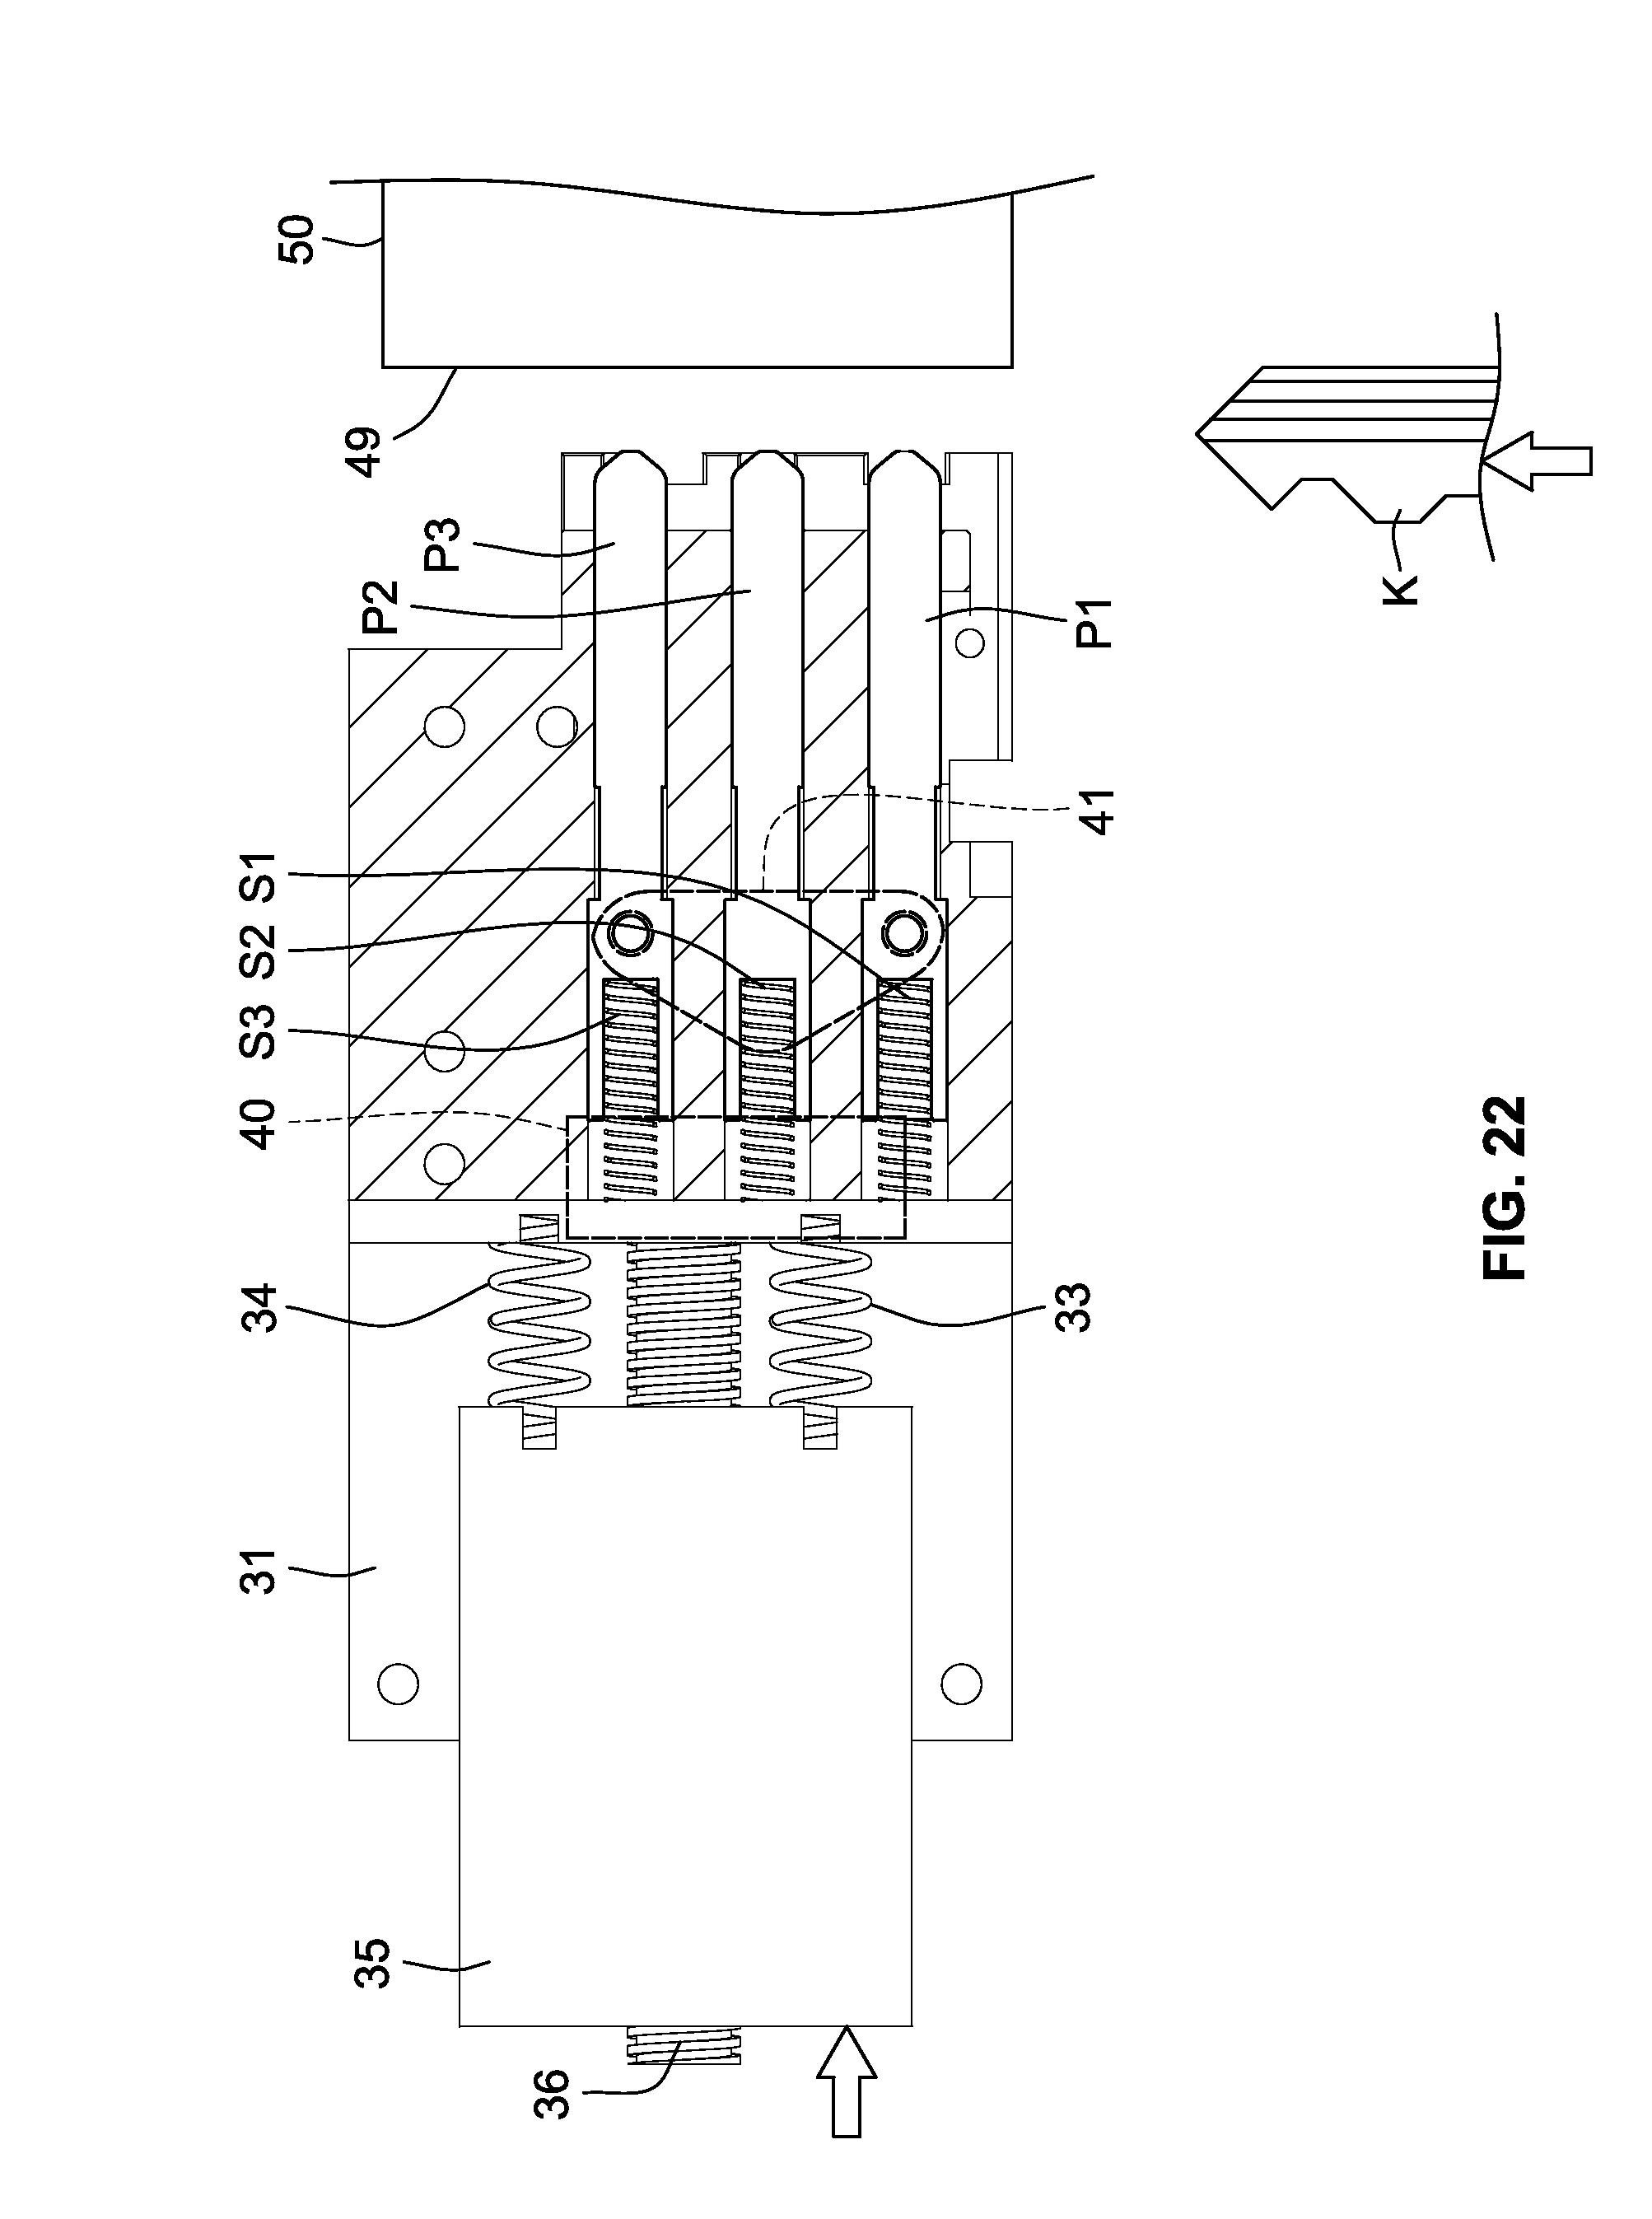 2001 mercury 200 efi wiring diagram  mercury  auto wiring